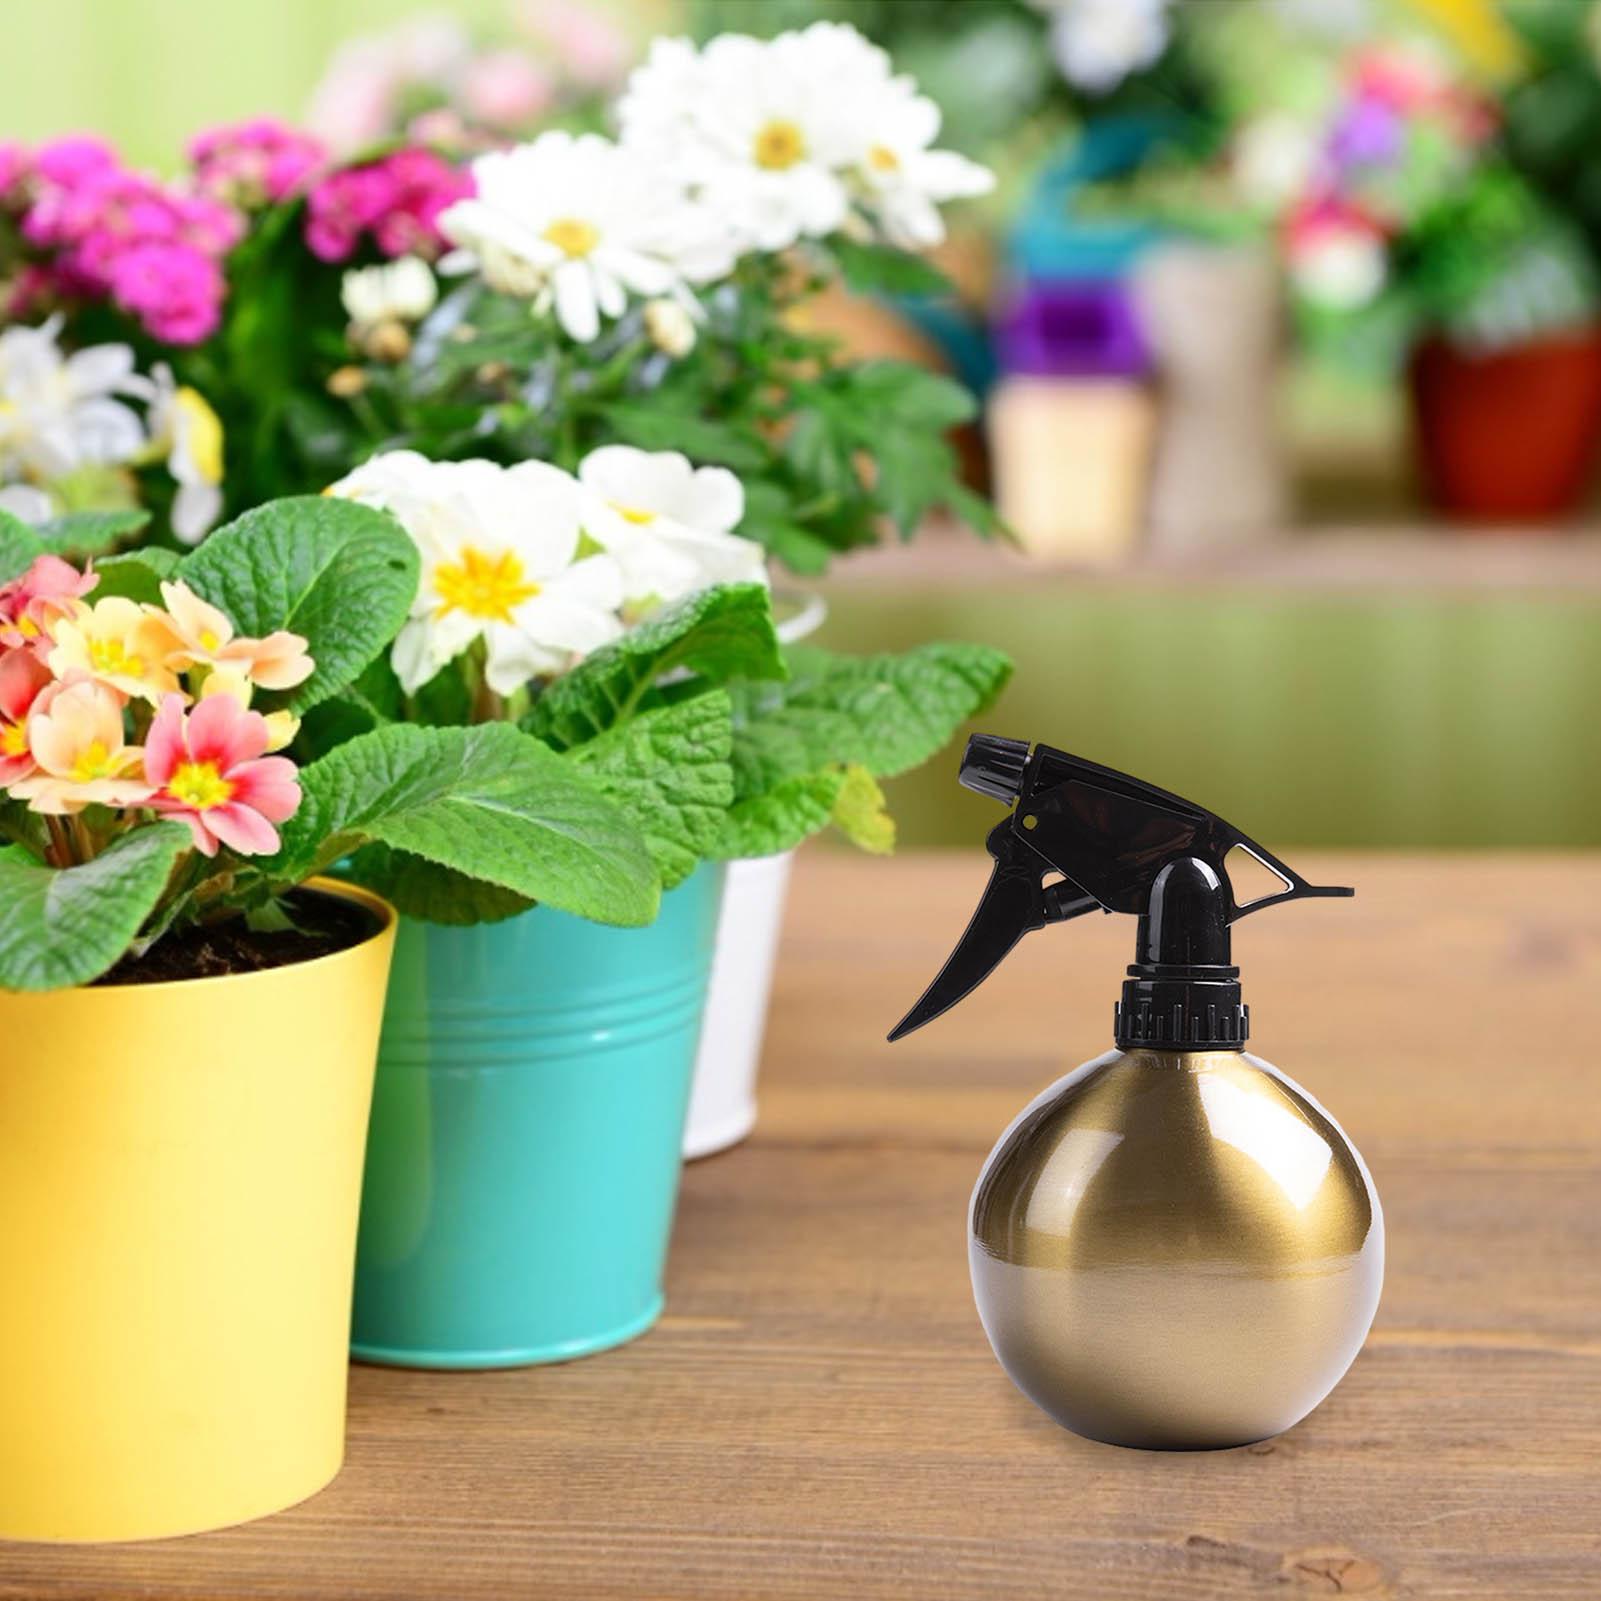 16X10CM Plant Spray Bottle Succulent Watering Bottle Can Sprayer Watering Pot For Indoor Outdoor Plants Watering-1